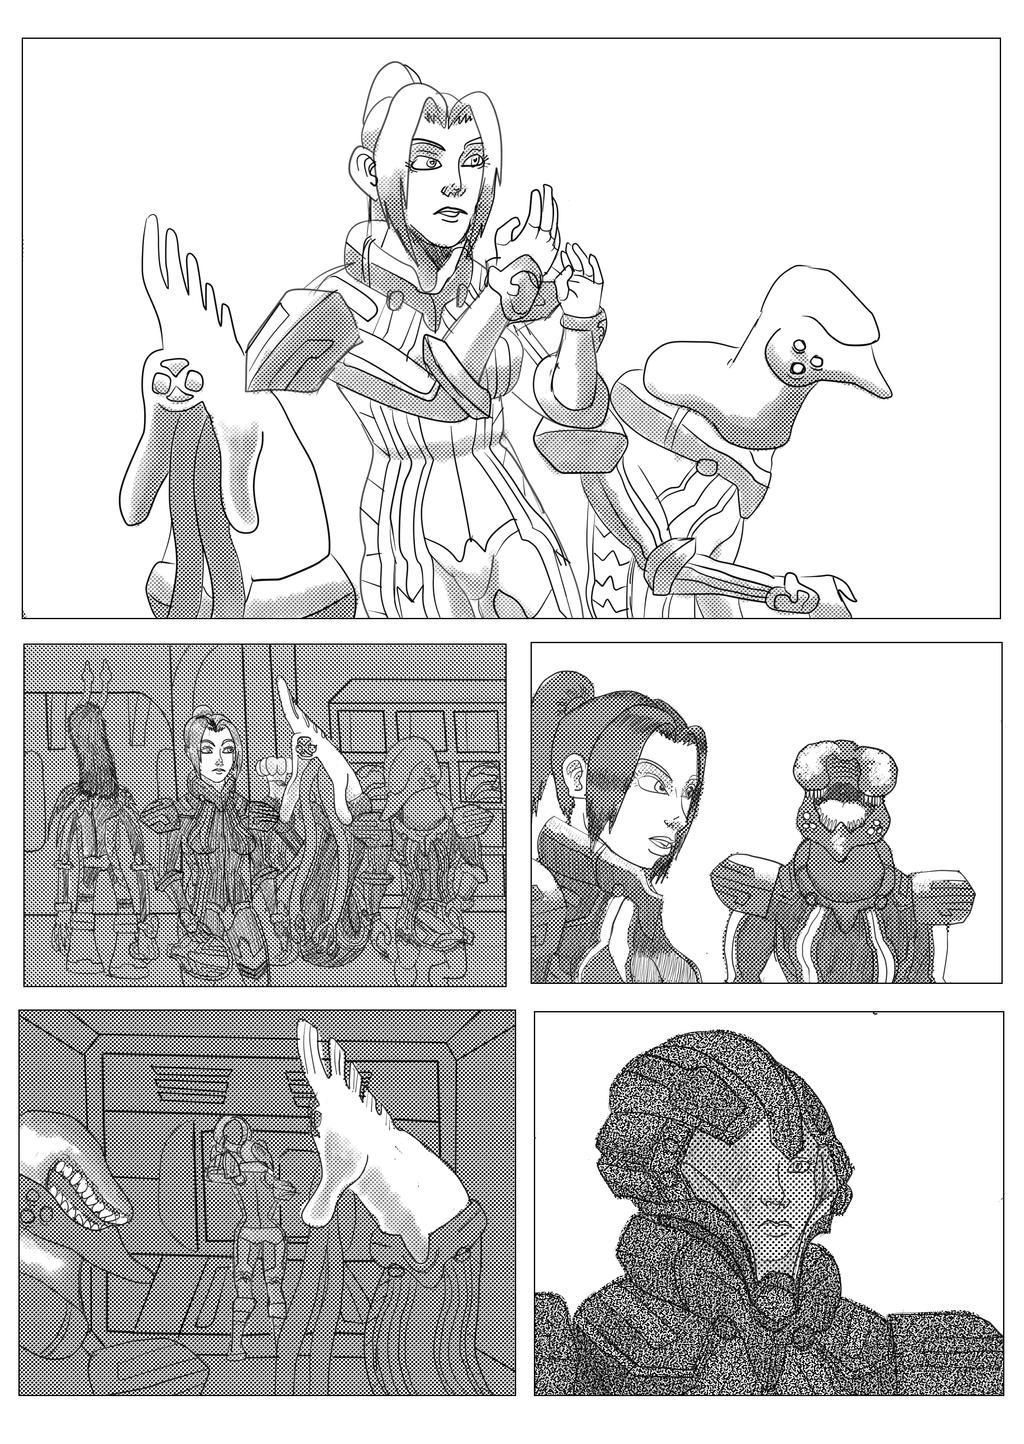 Starfighter Comic Page By Sabertoothliger On Deviantart Fanpage brasileira dedicada a webcomic starfighter. starfighter comic page by